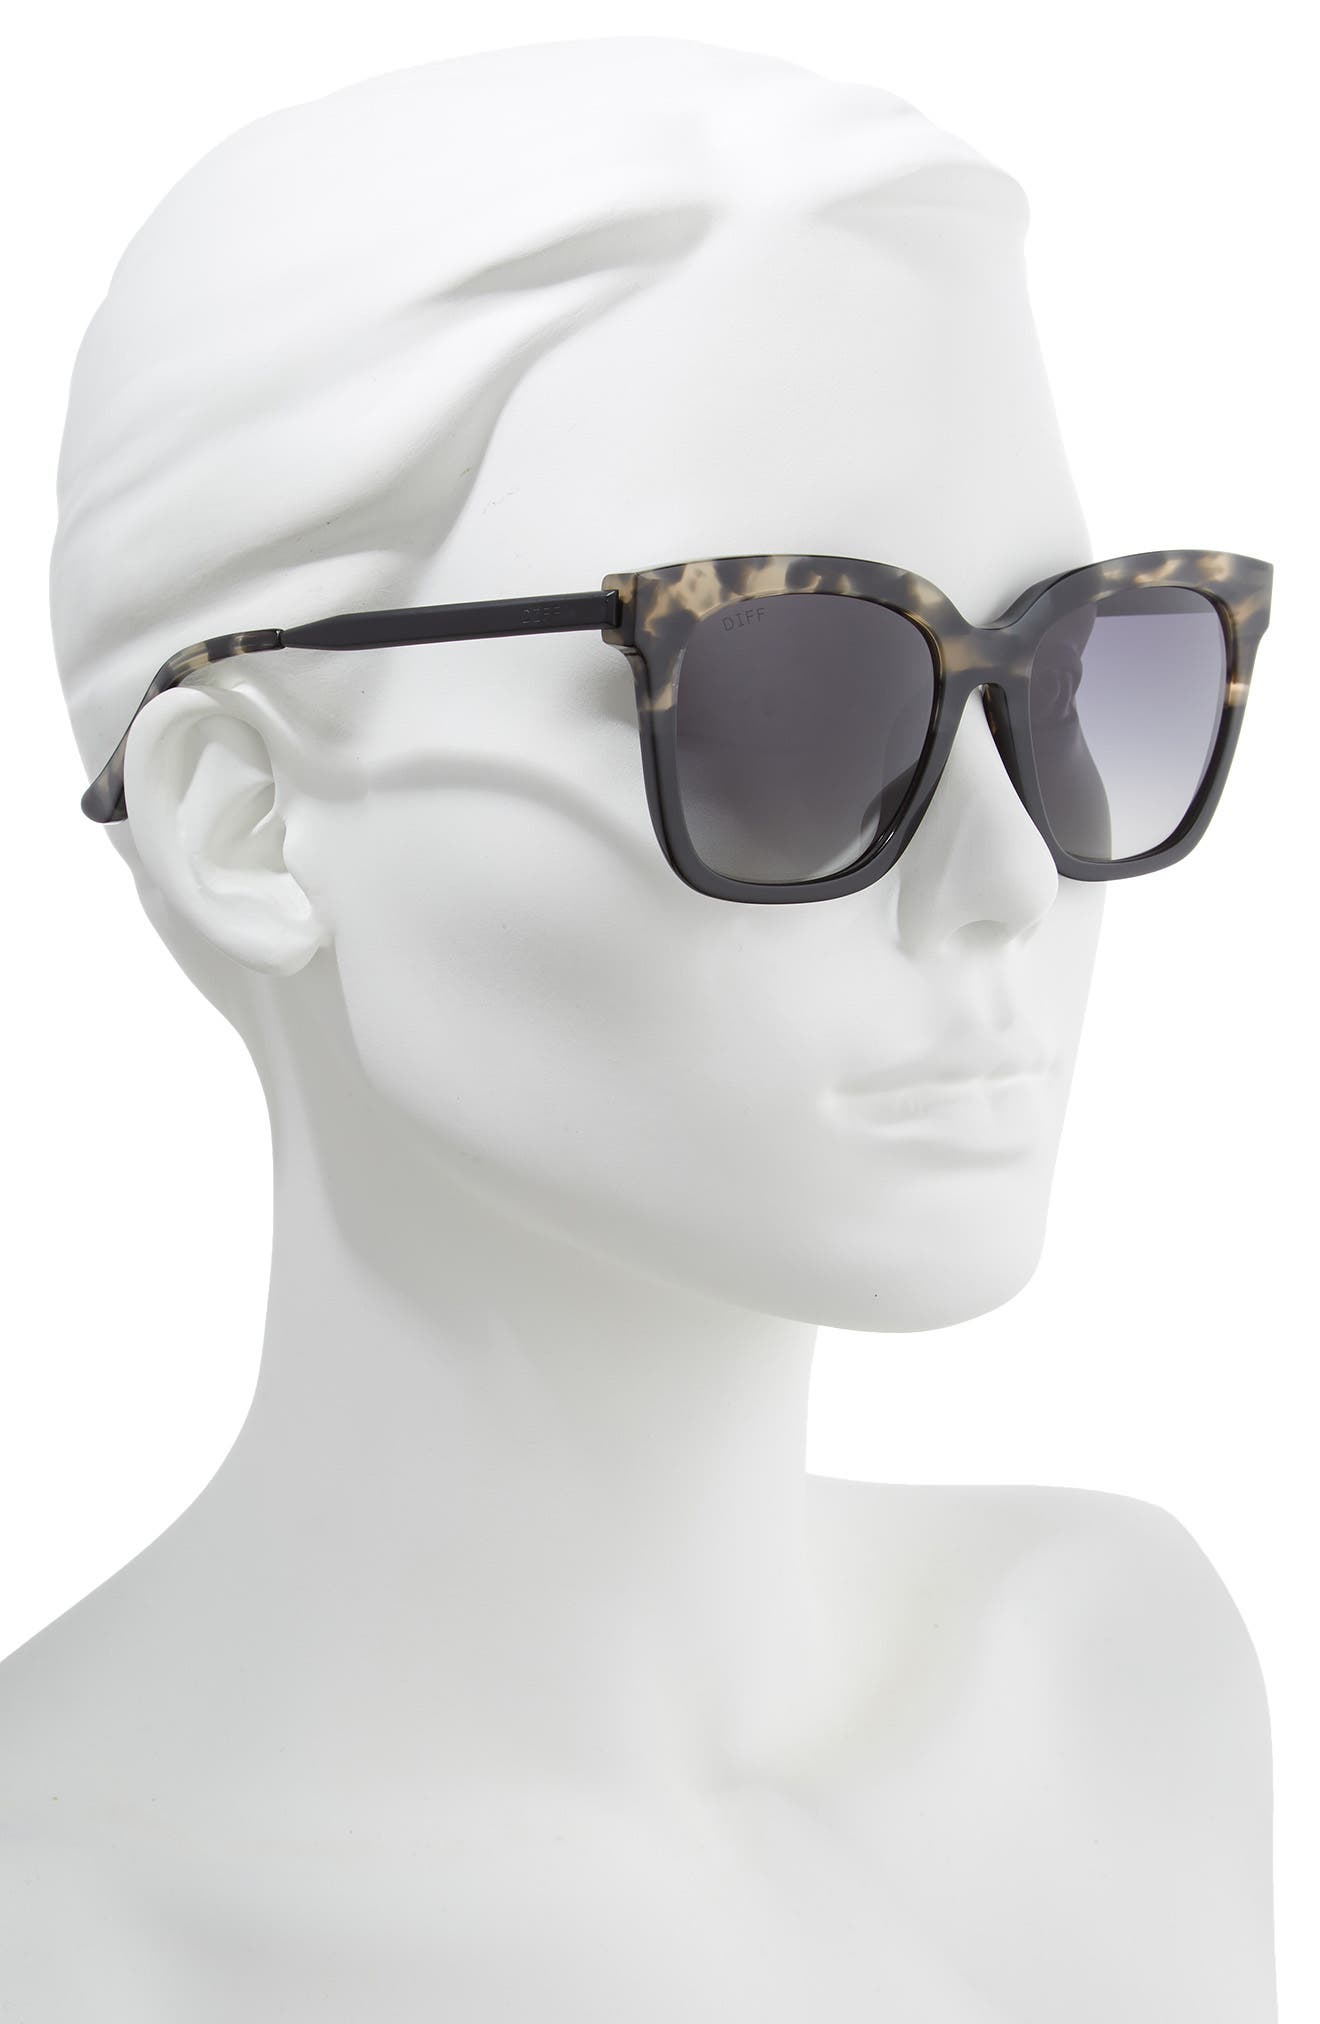 Bella 52mm Polarized Sunglasses,                             Alternate thumbnail 2, color,                             GREY FAGE/ GREY